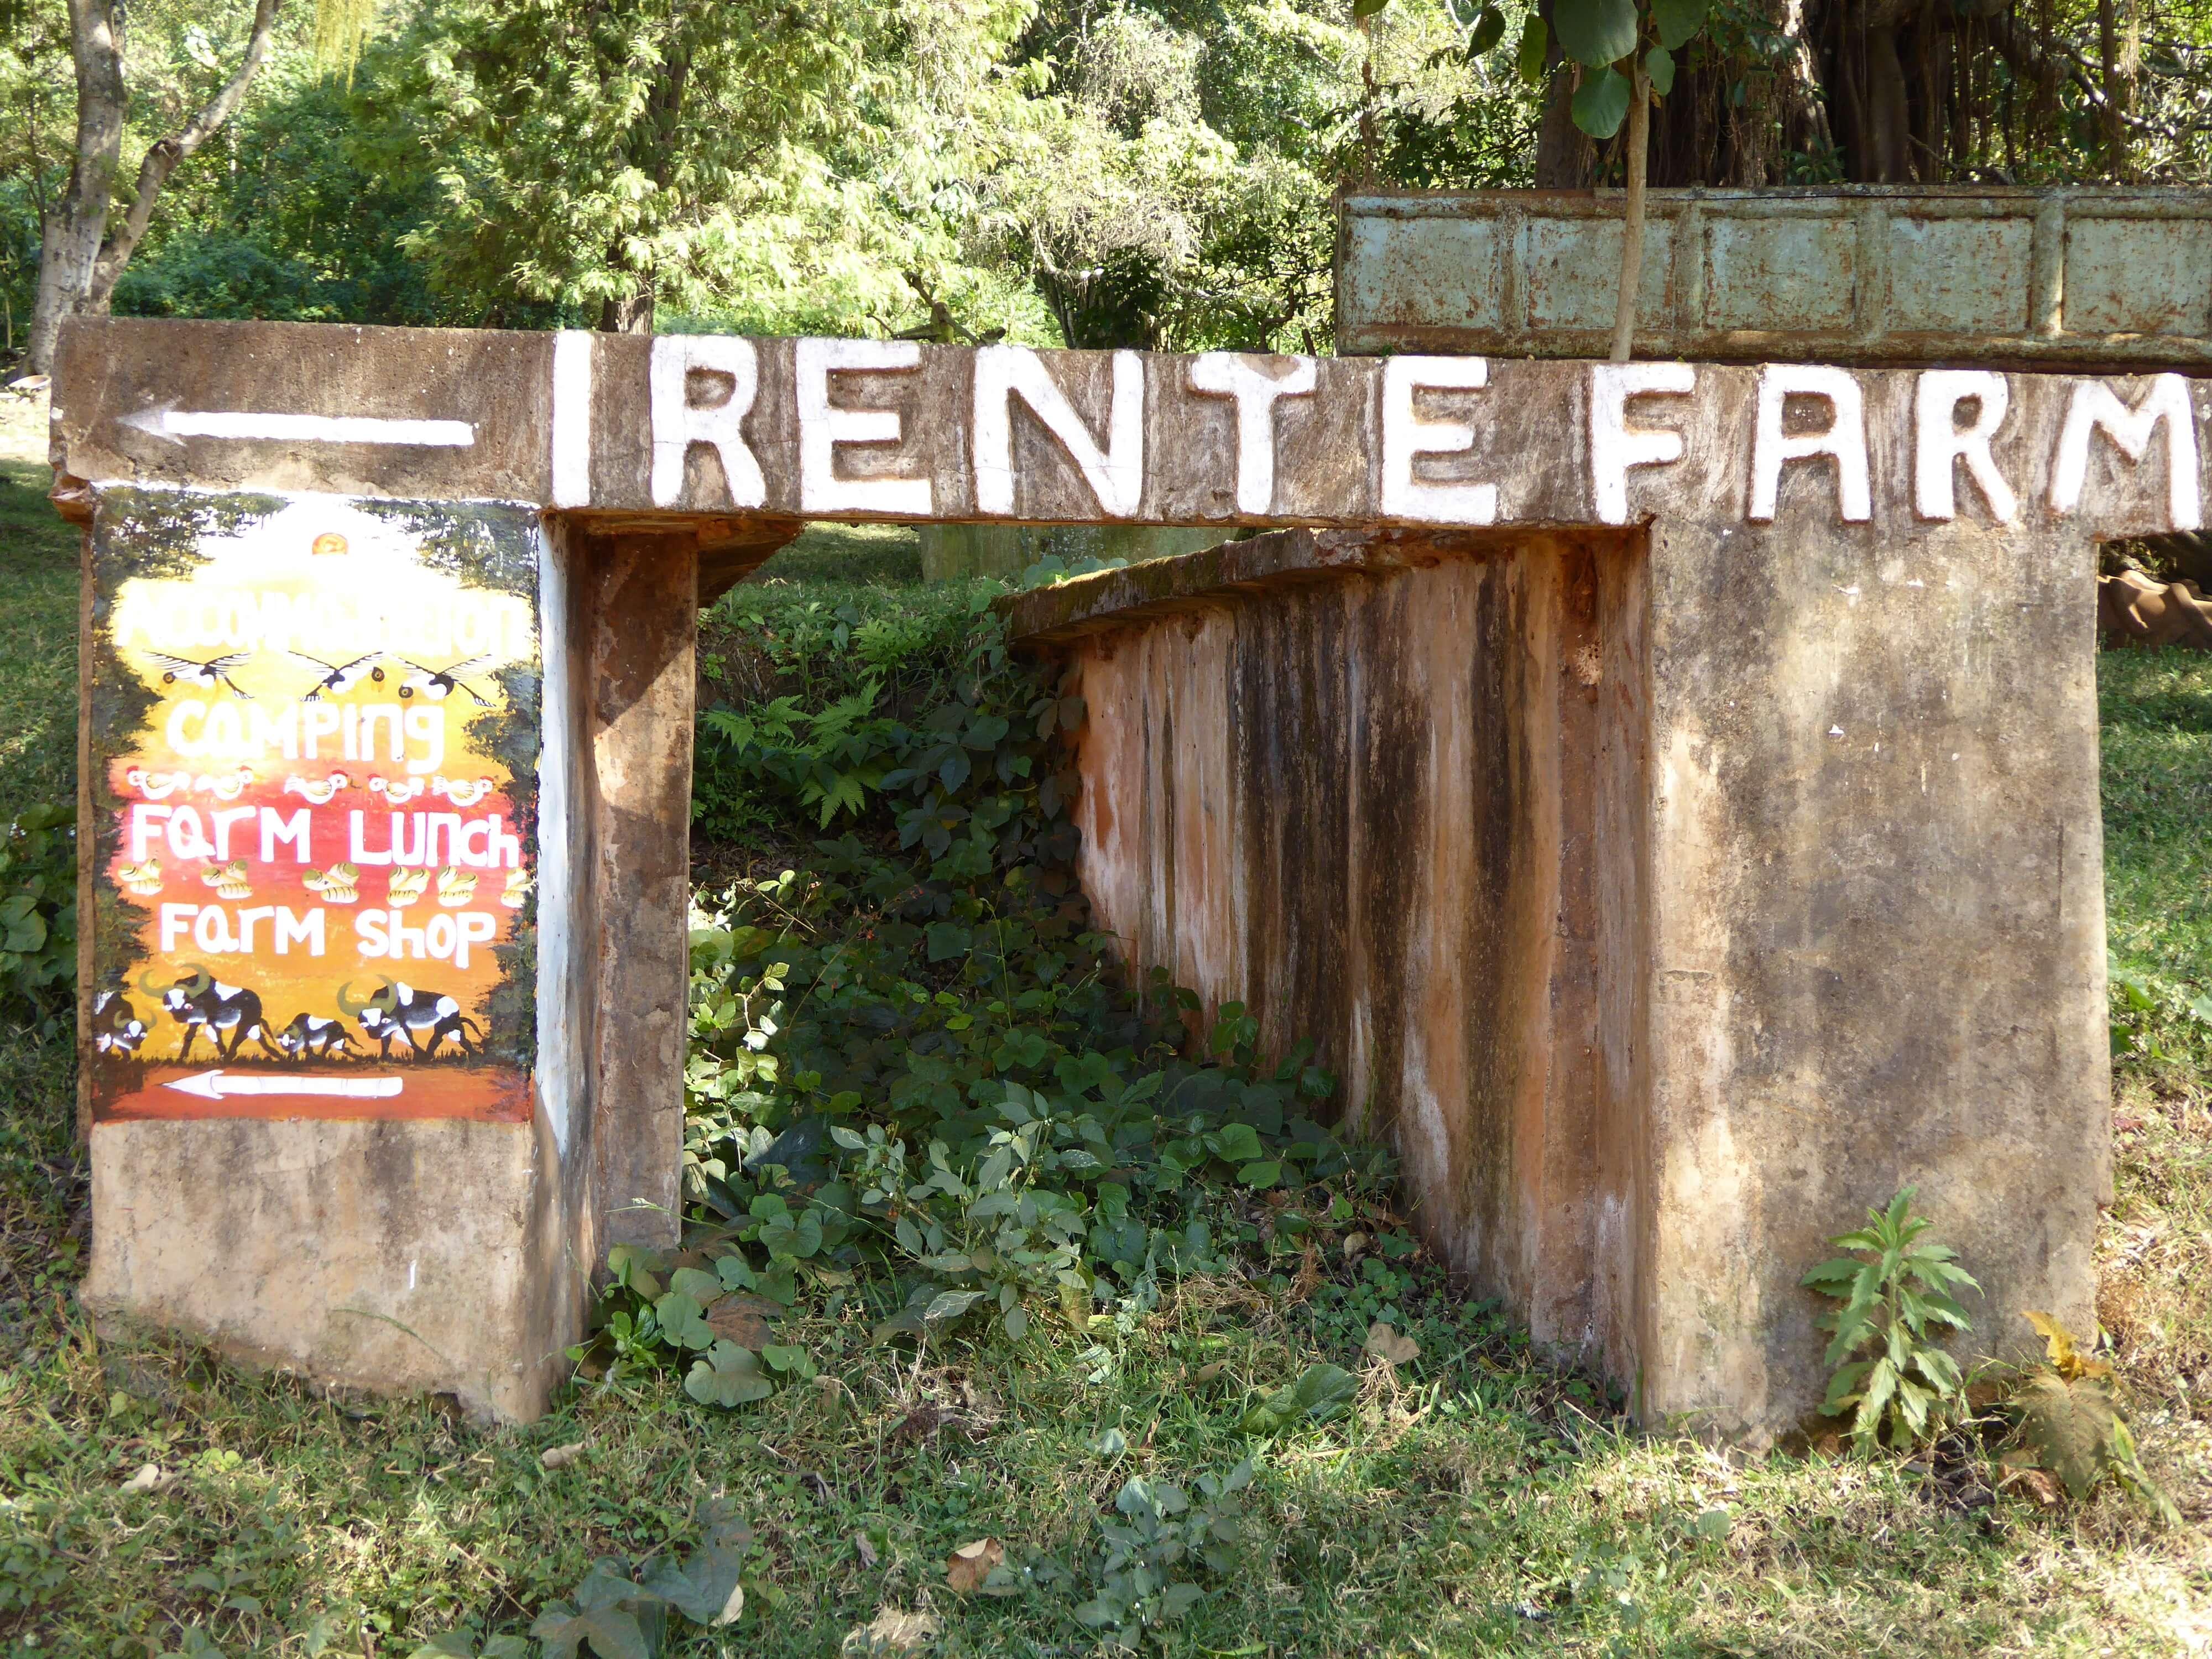 Irente Farm